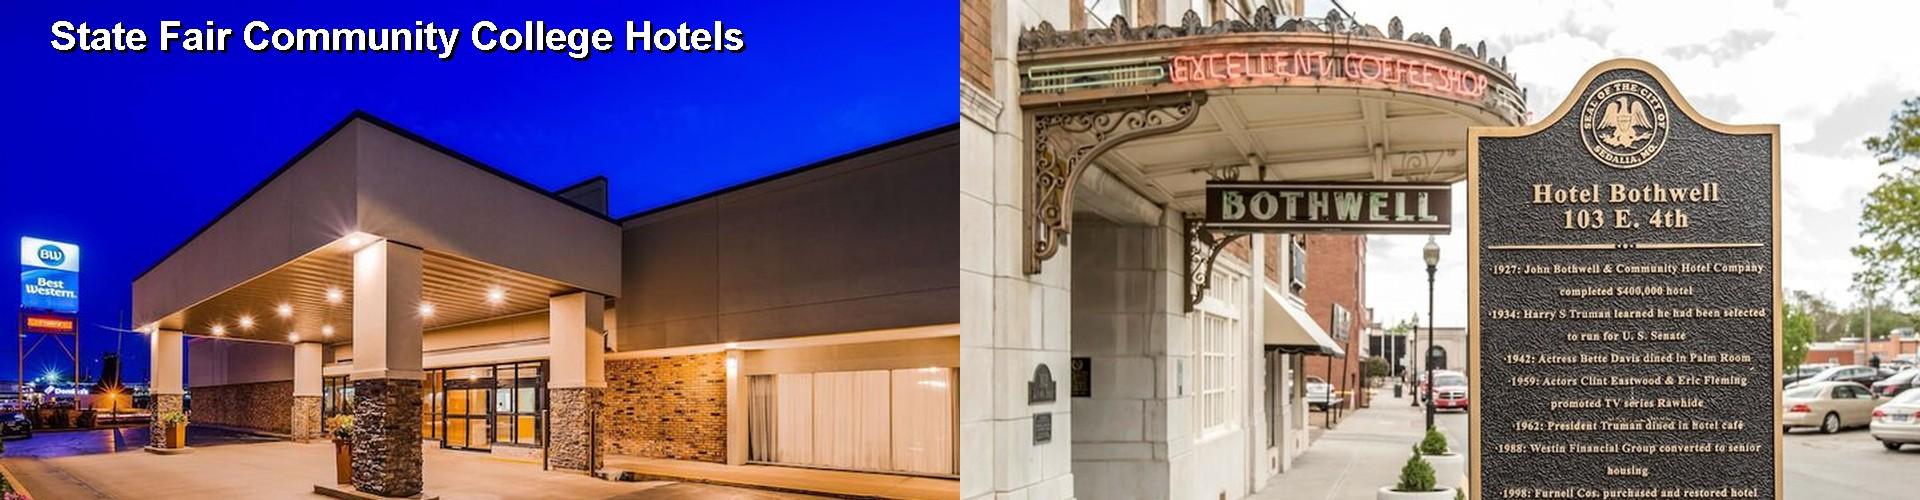 42 Hotels Near State Fair Community College In Sedalia Mo